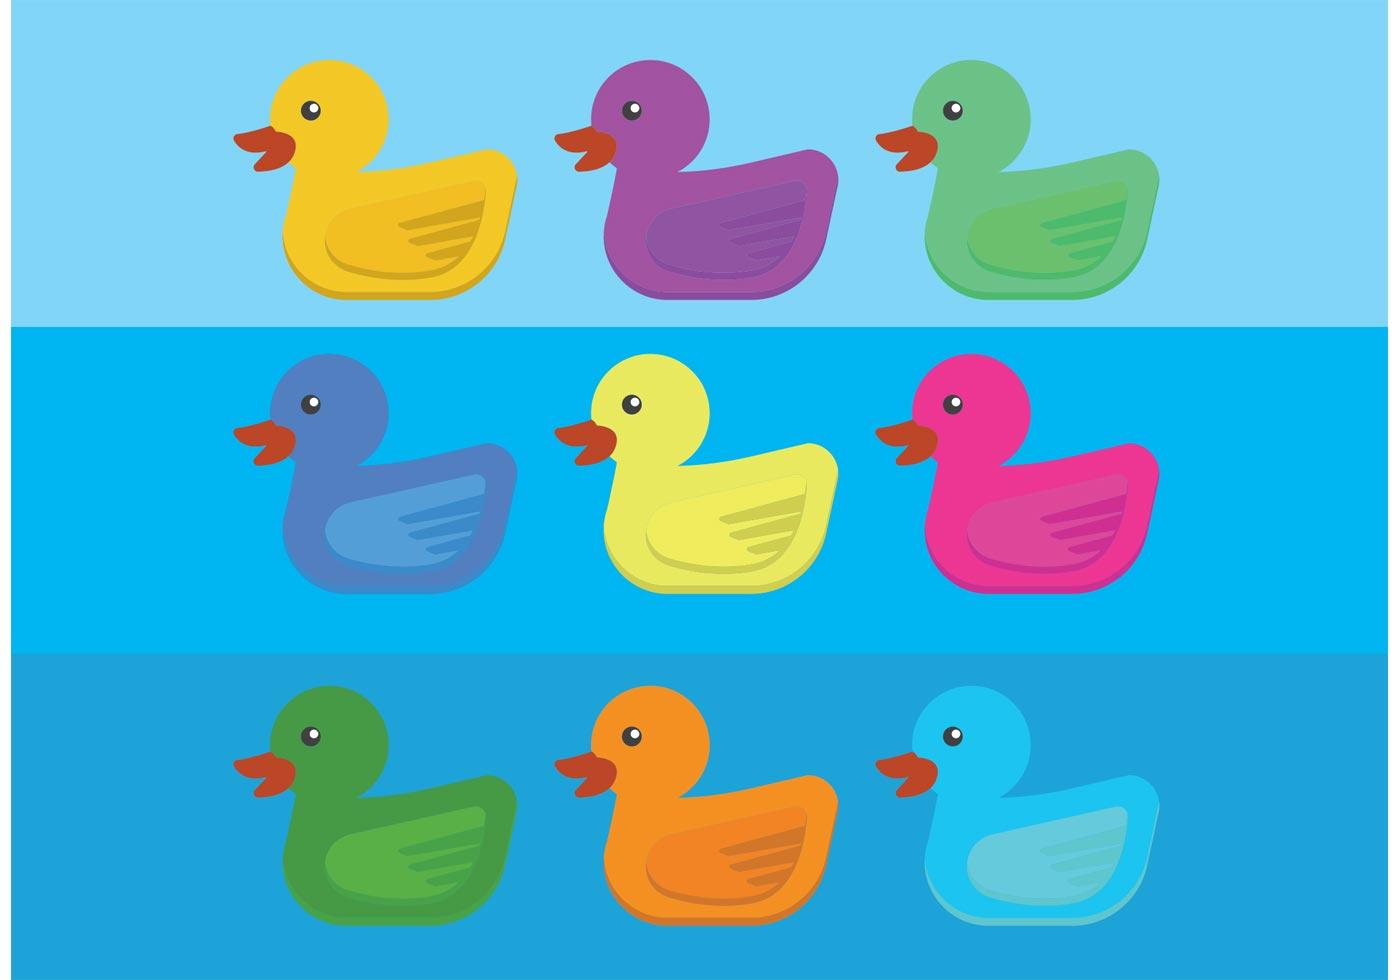 Colorful Rubber Duck Vectors Download Free Vector Art